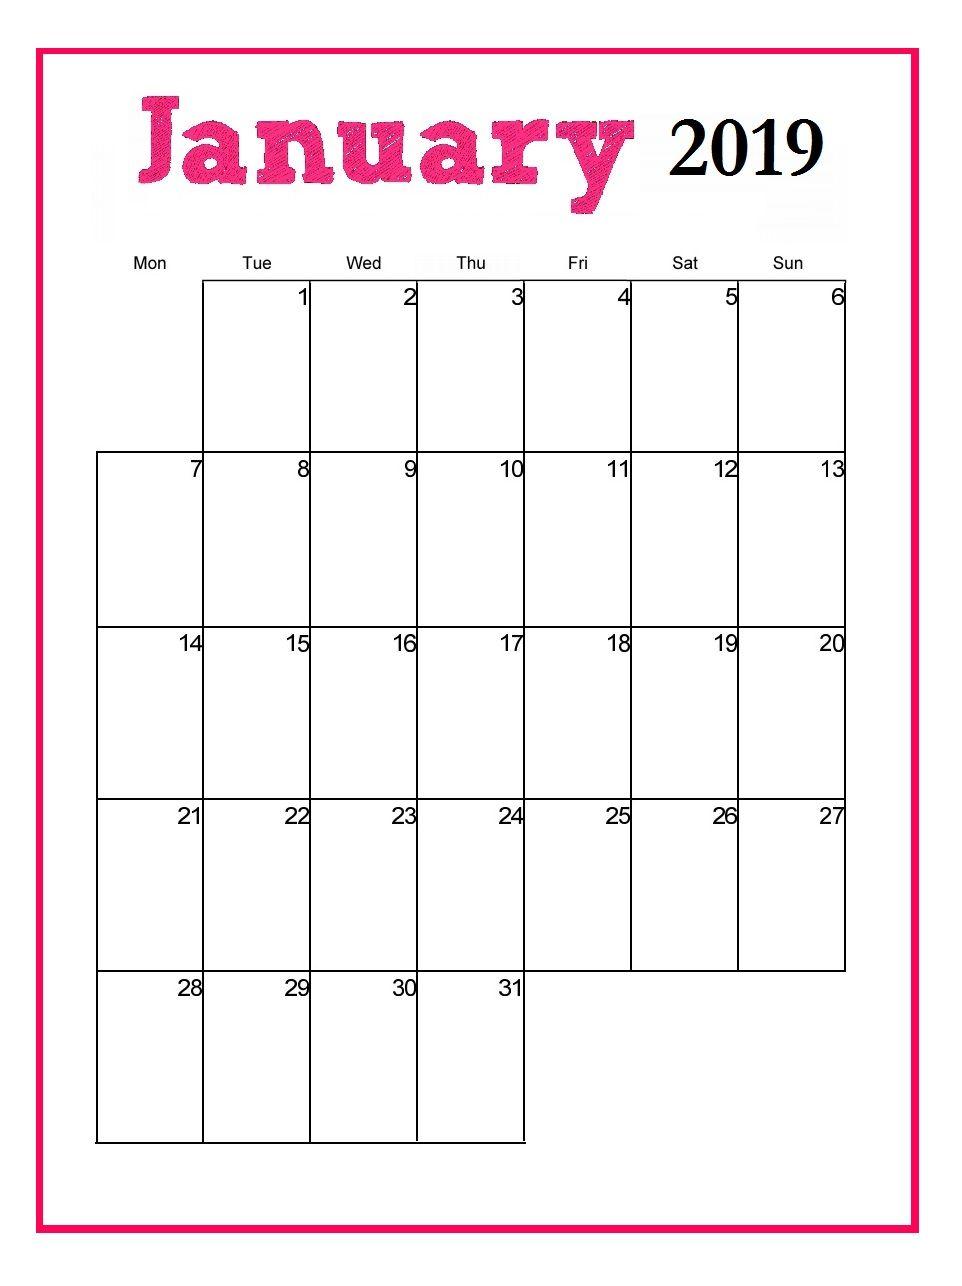 January Vertical Calendar 2019 Printable January 2019 Vertical Calendar | MaxCalendars | Monthly